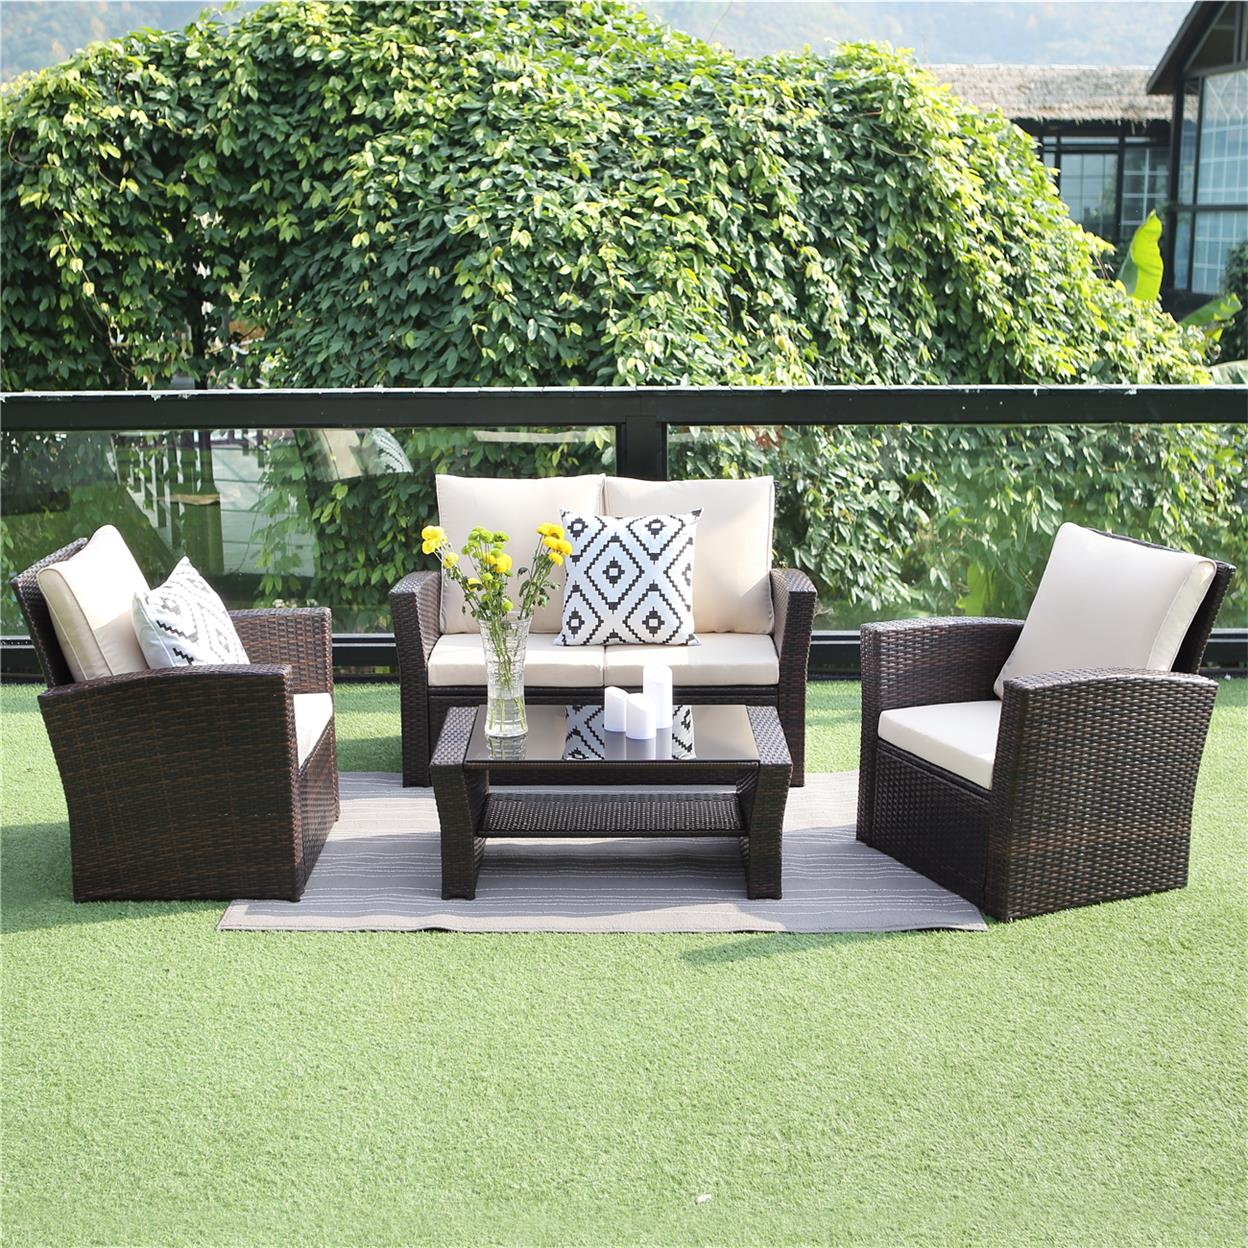 Outdoor Patio Furniture Set Wisteria